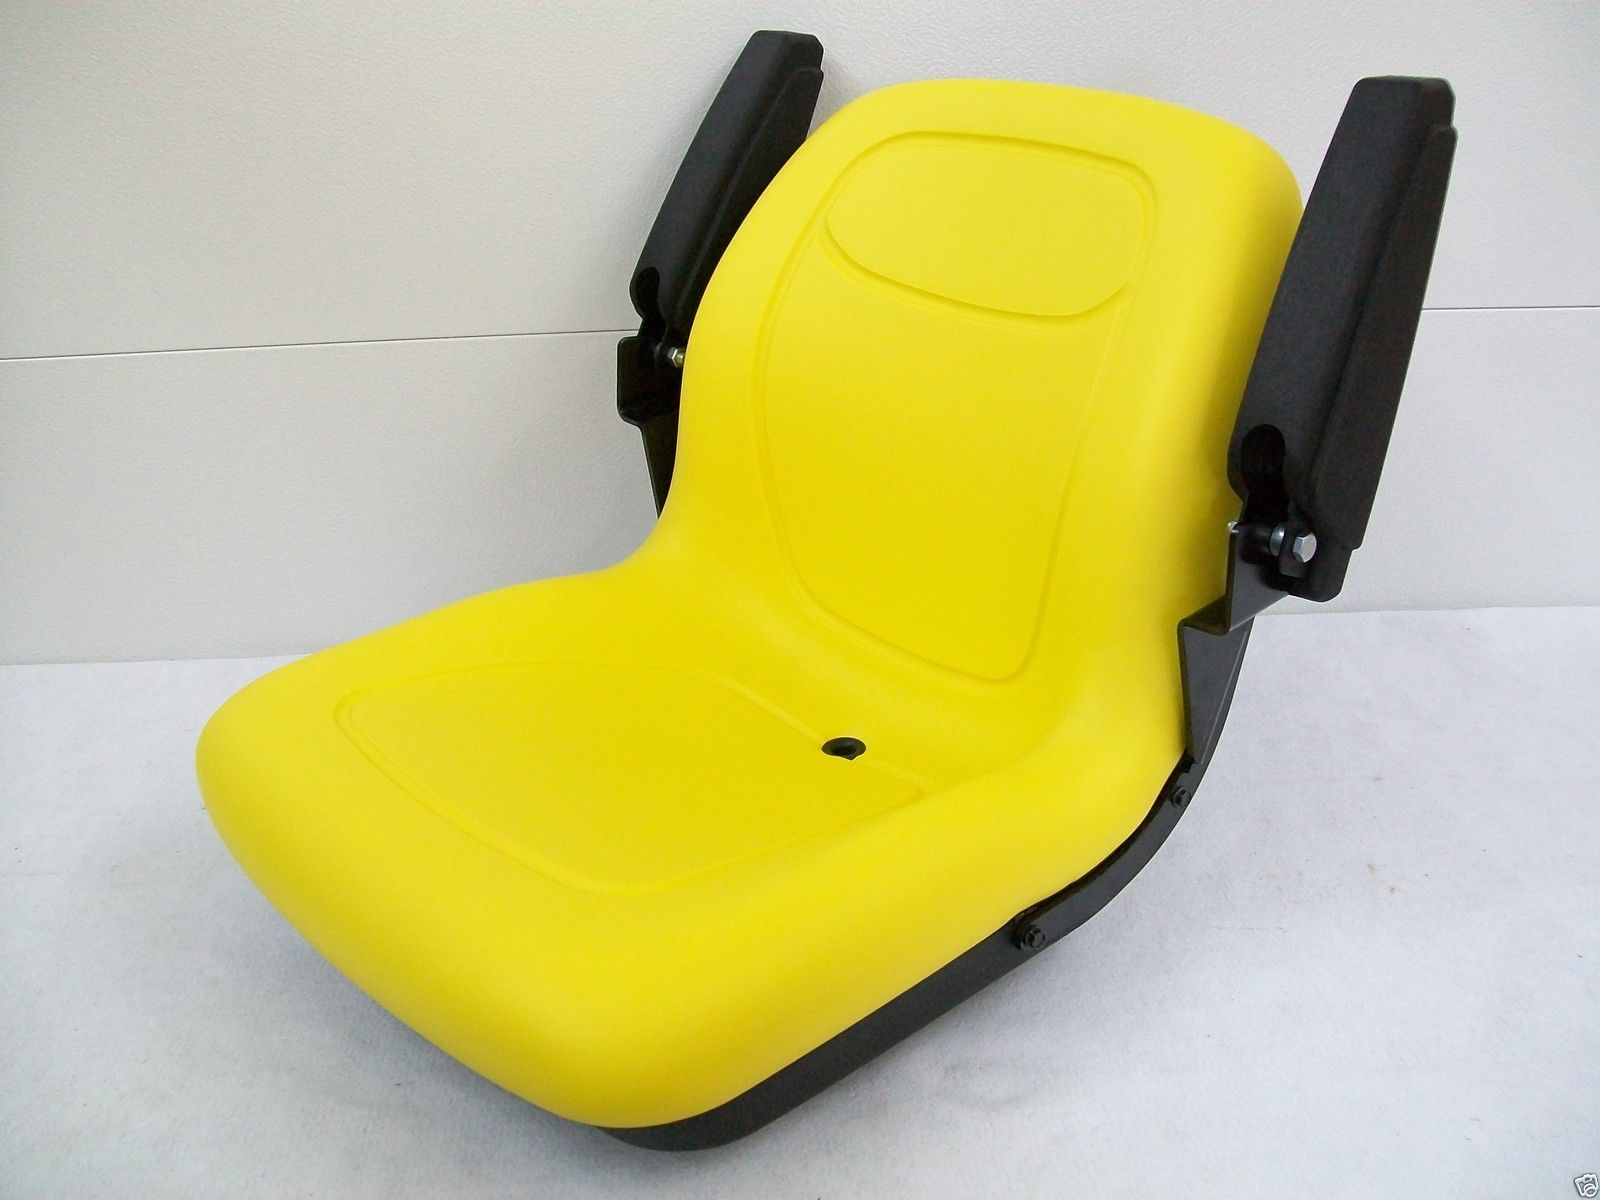 YELLOW SEATS FITS JD JOHN DEERE 3203 1023E 3032E 3038E COMPACT – John Deere 1023e Wiring Diagram